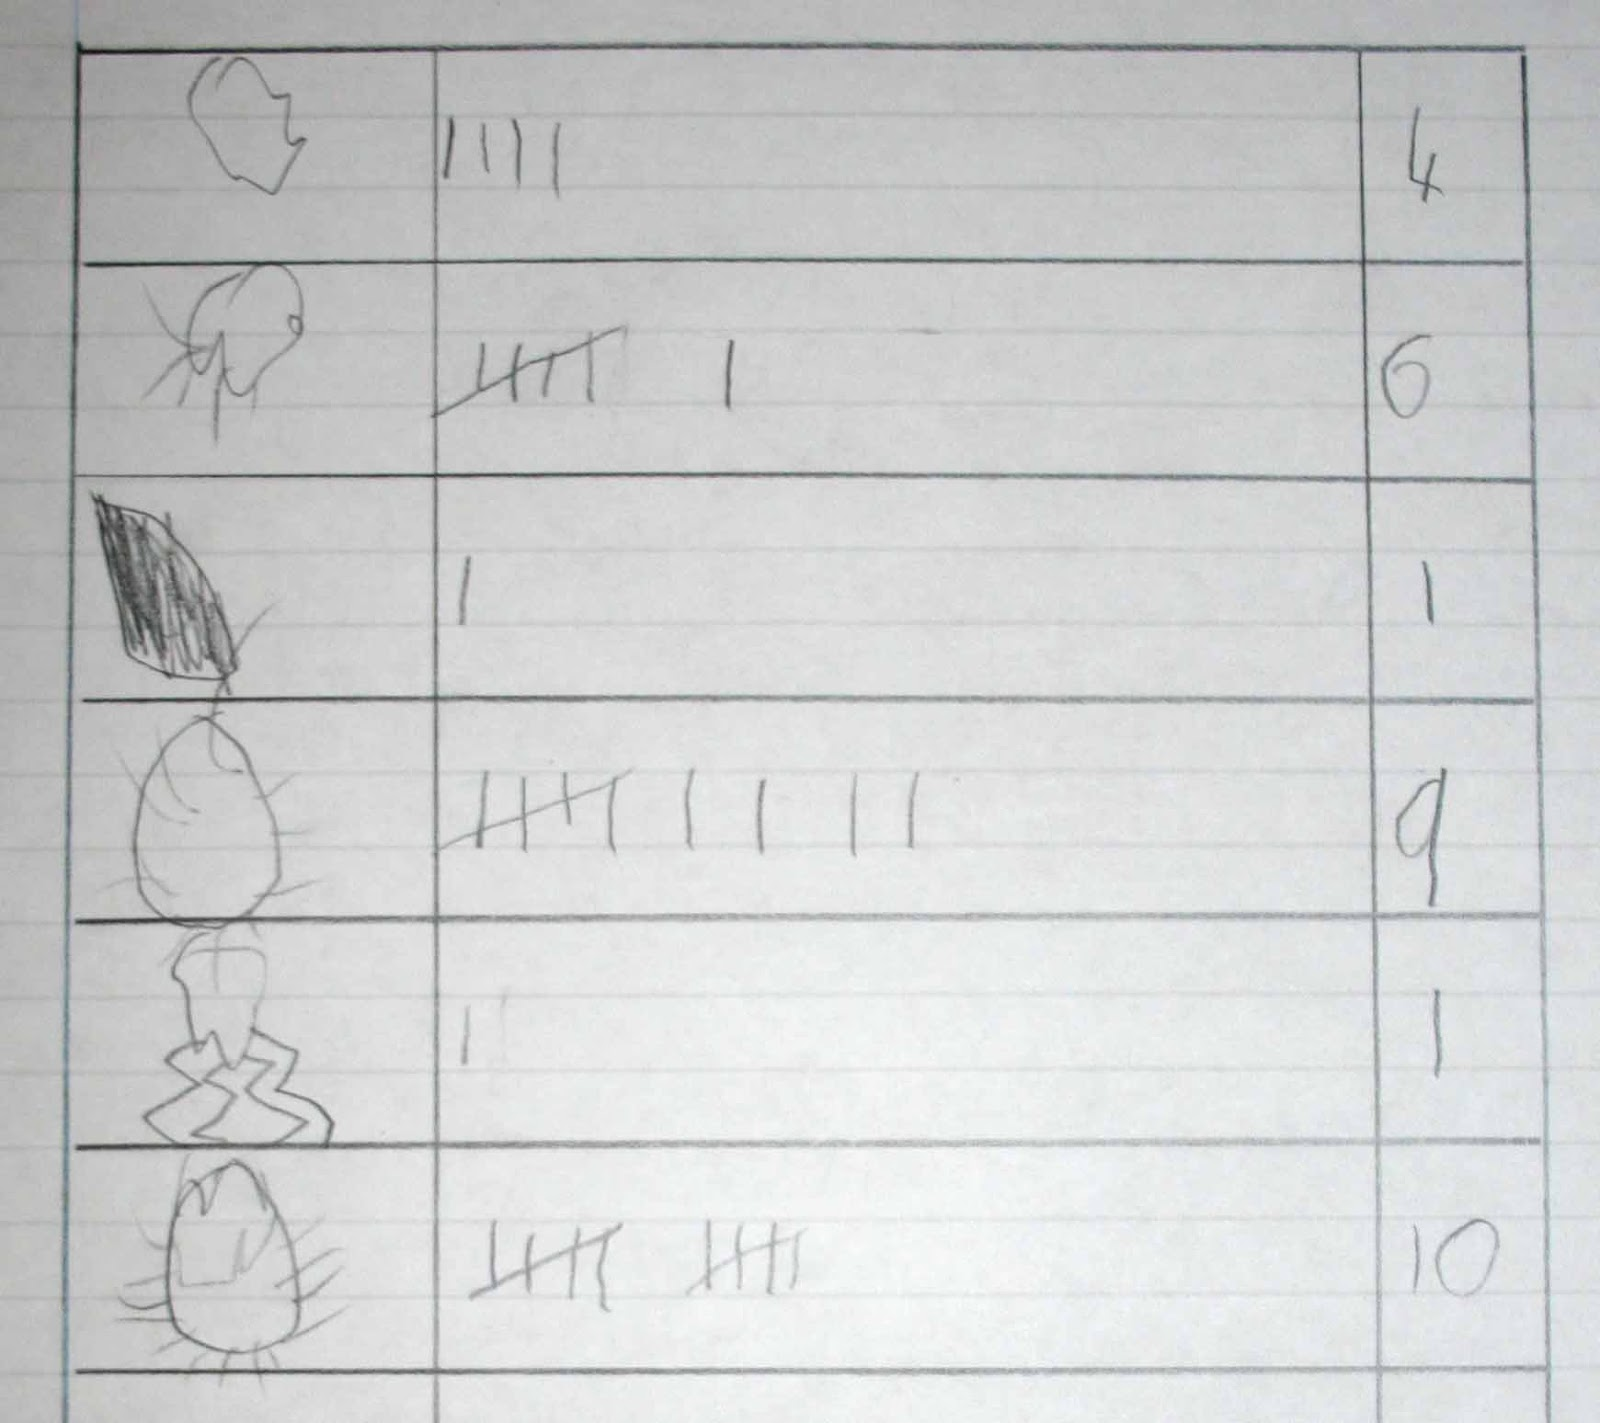 Creating And Educating Charts And Graphs